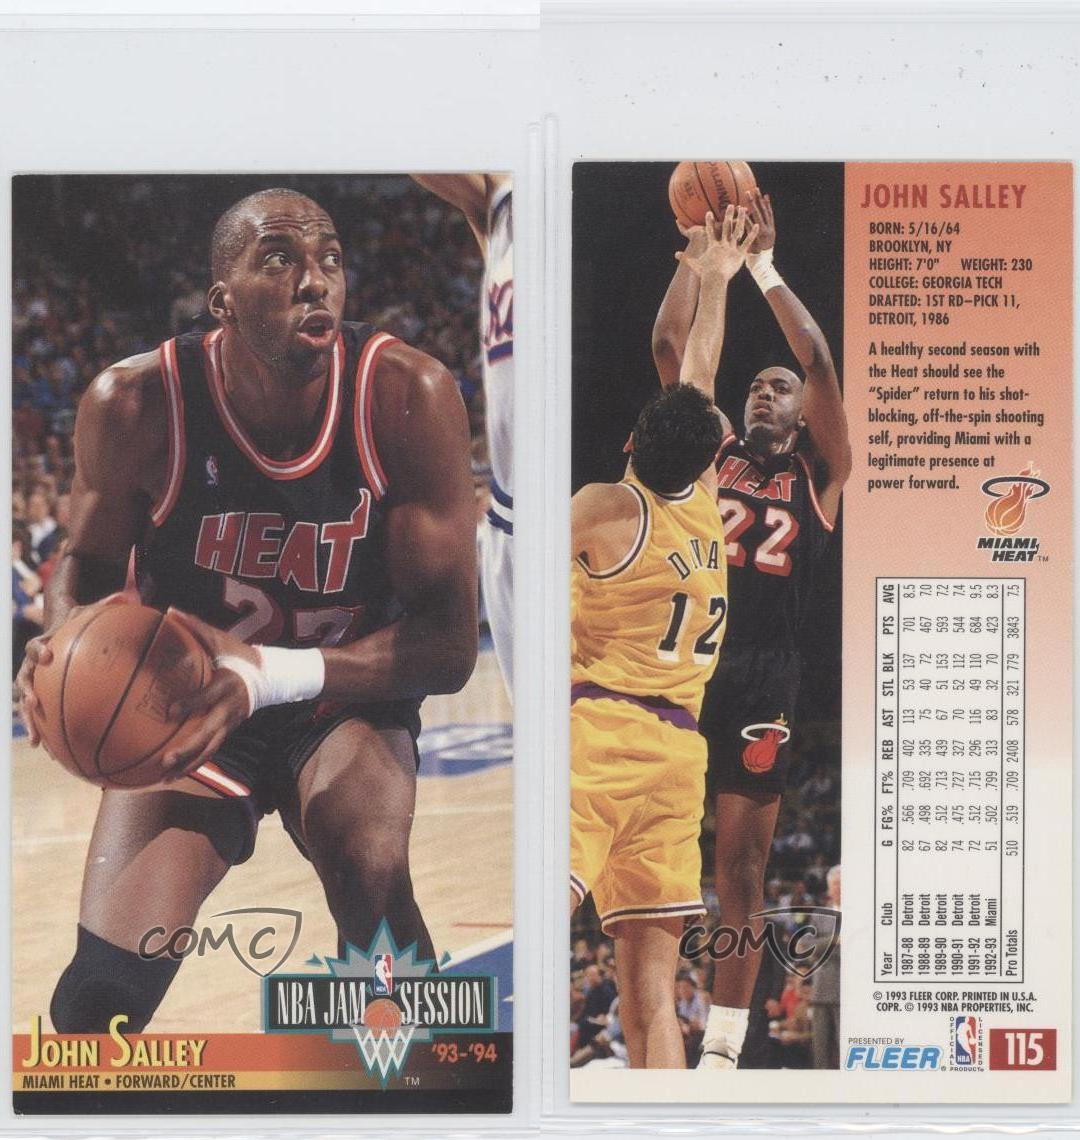 1993-94 NBA Jam Session #115 John Salley Miami Heat